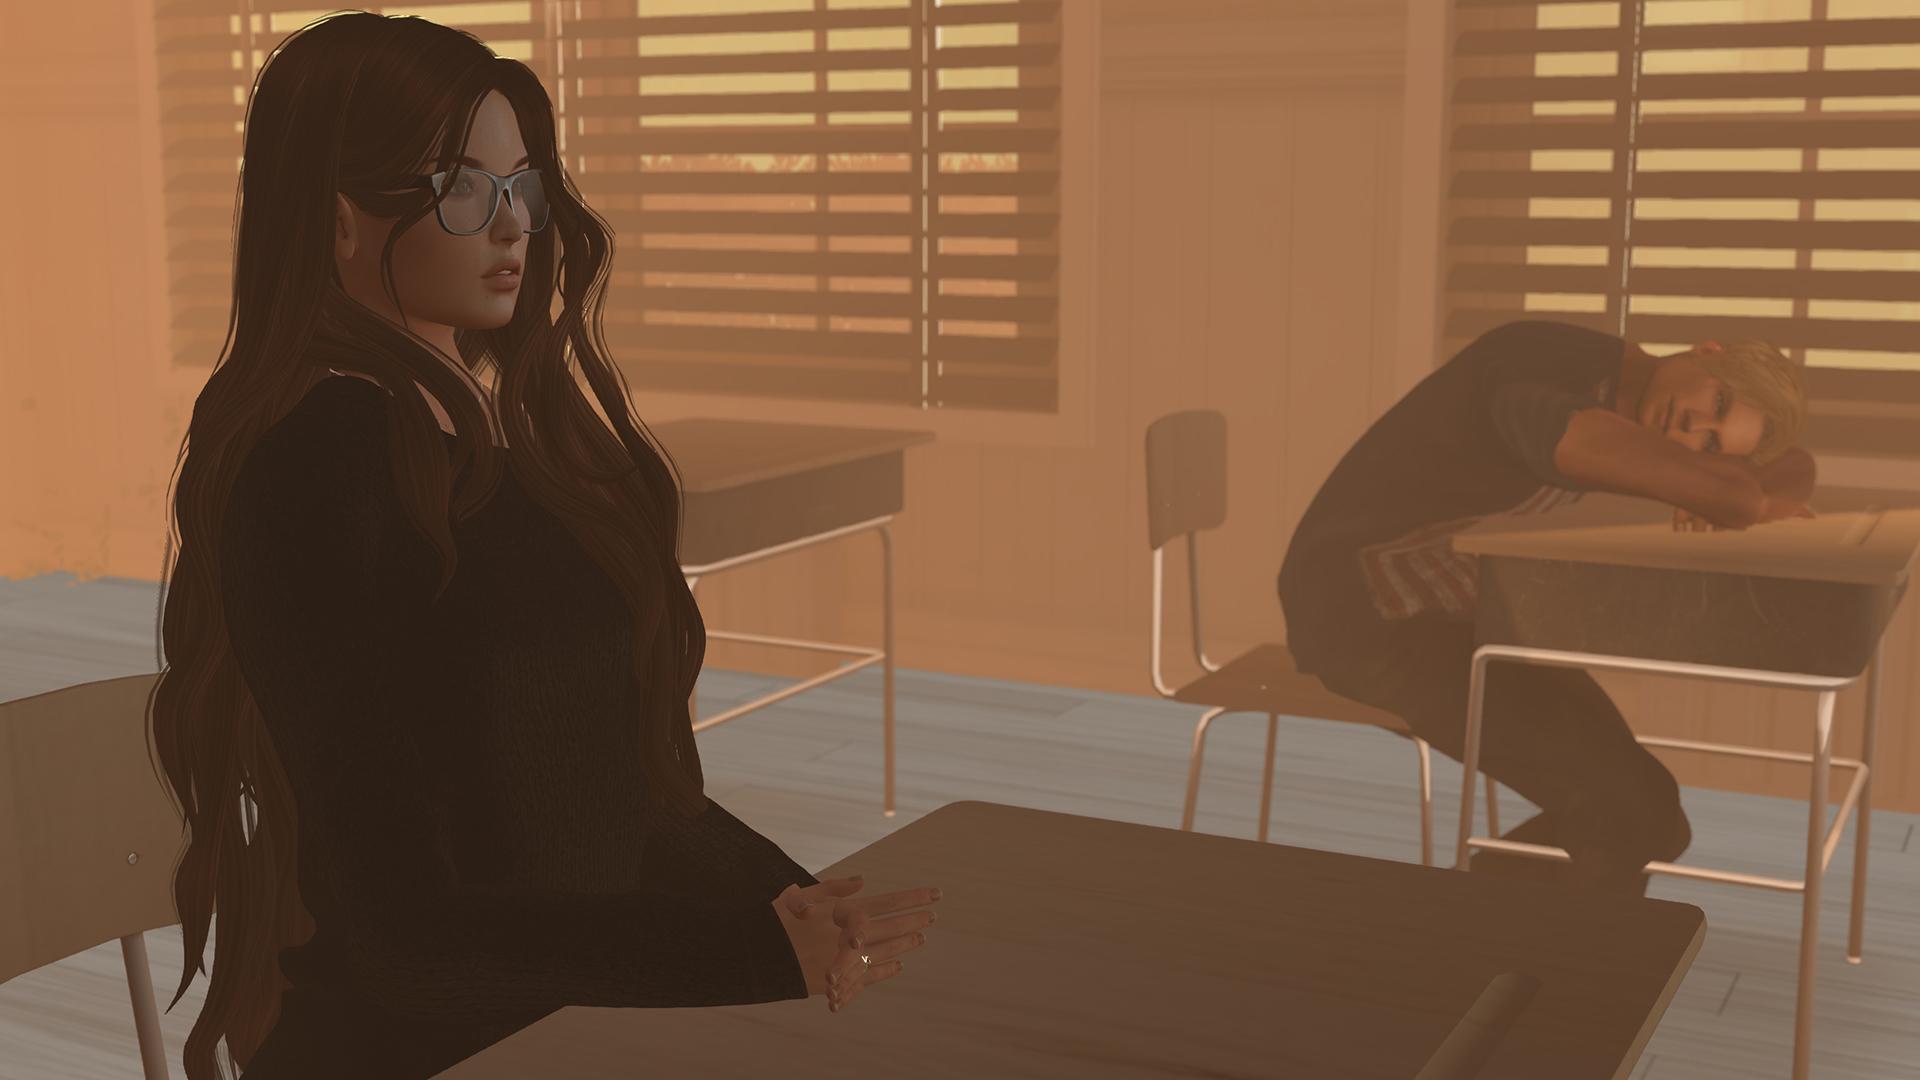 Wallpaper : table, Avatar, Firestorm, VirTual, girl, design